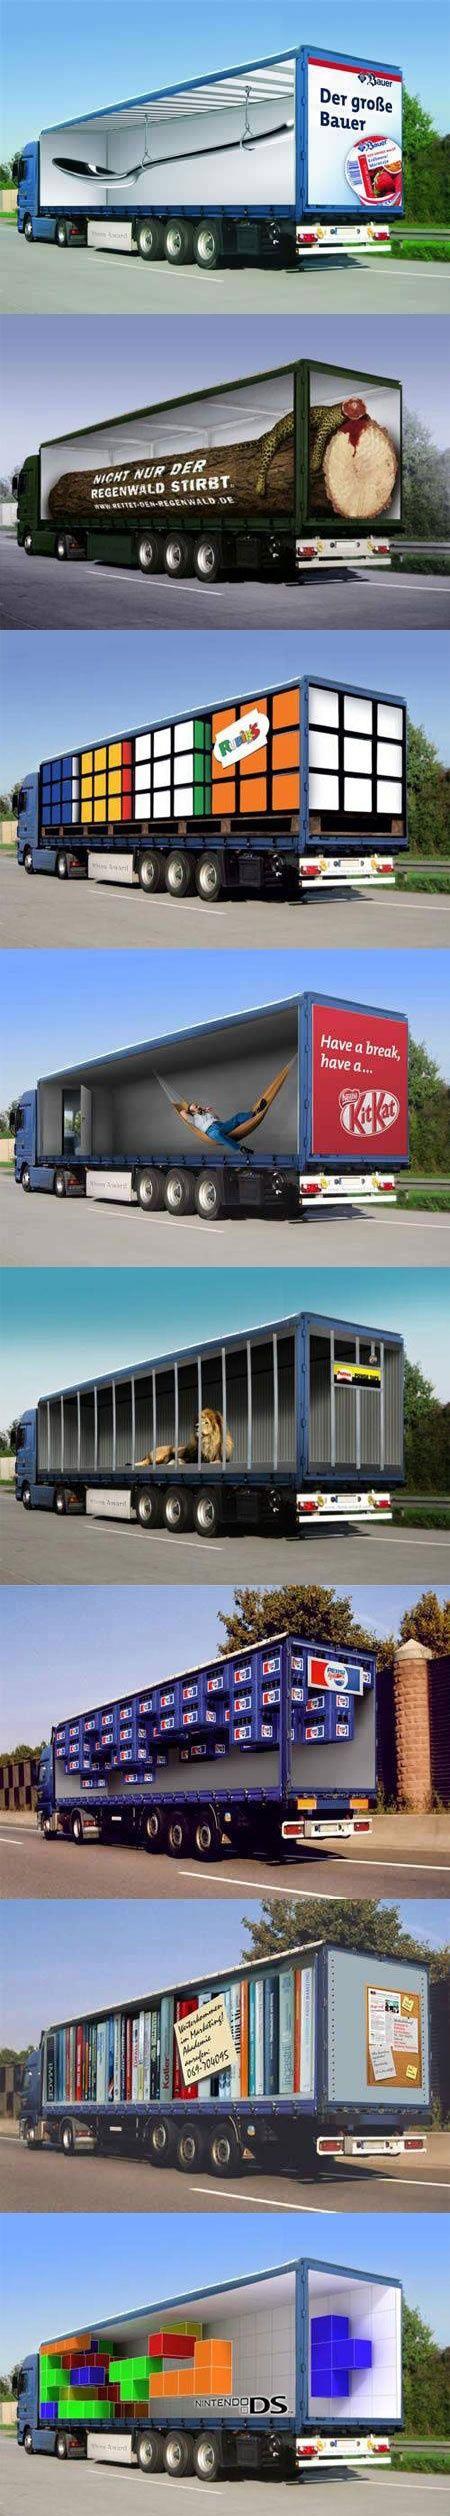 Optical illusion truck ads